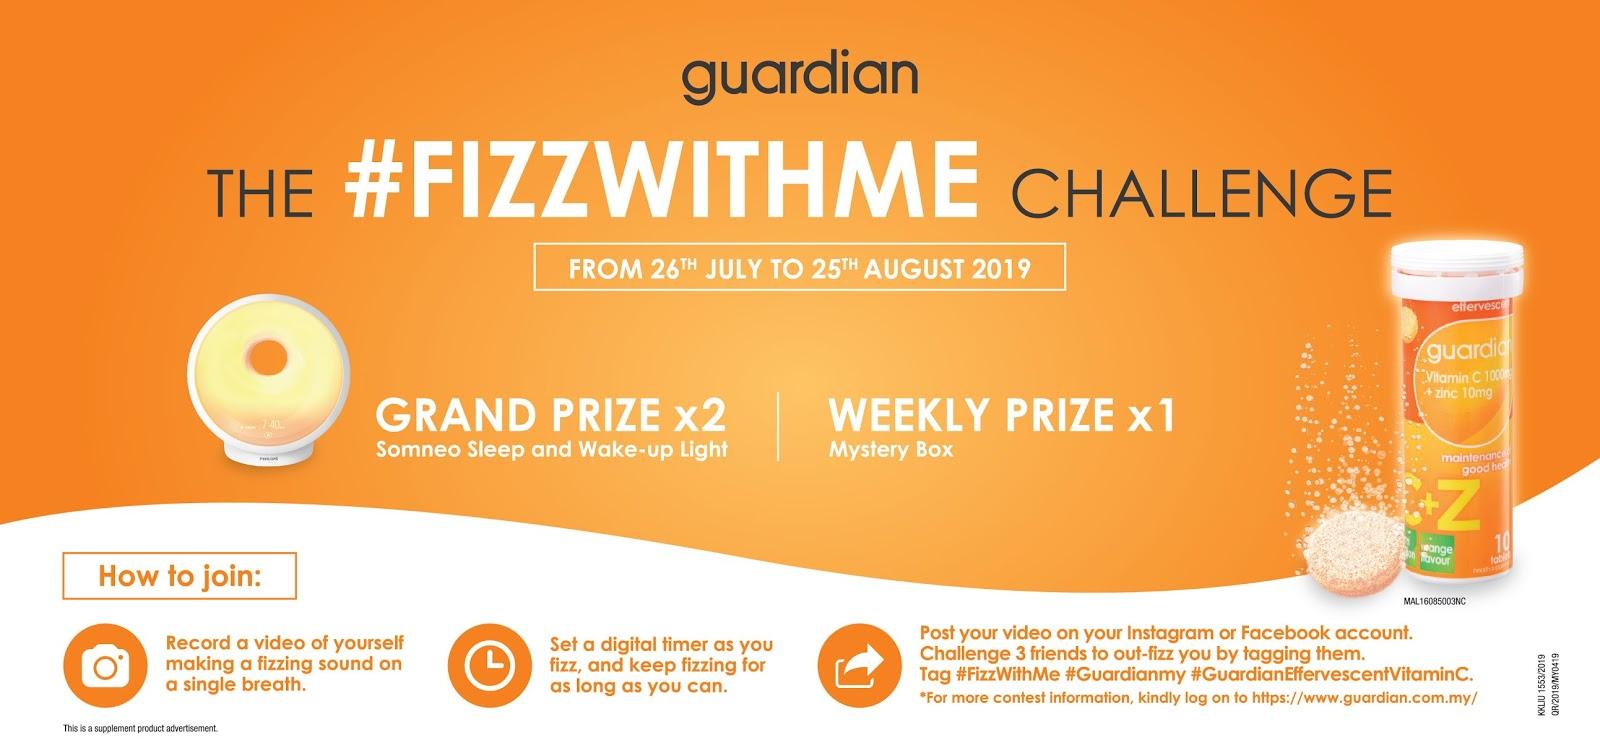 My Blogs: Guardian Vitamin C + Zinc #FizzWithMe Challenge